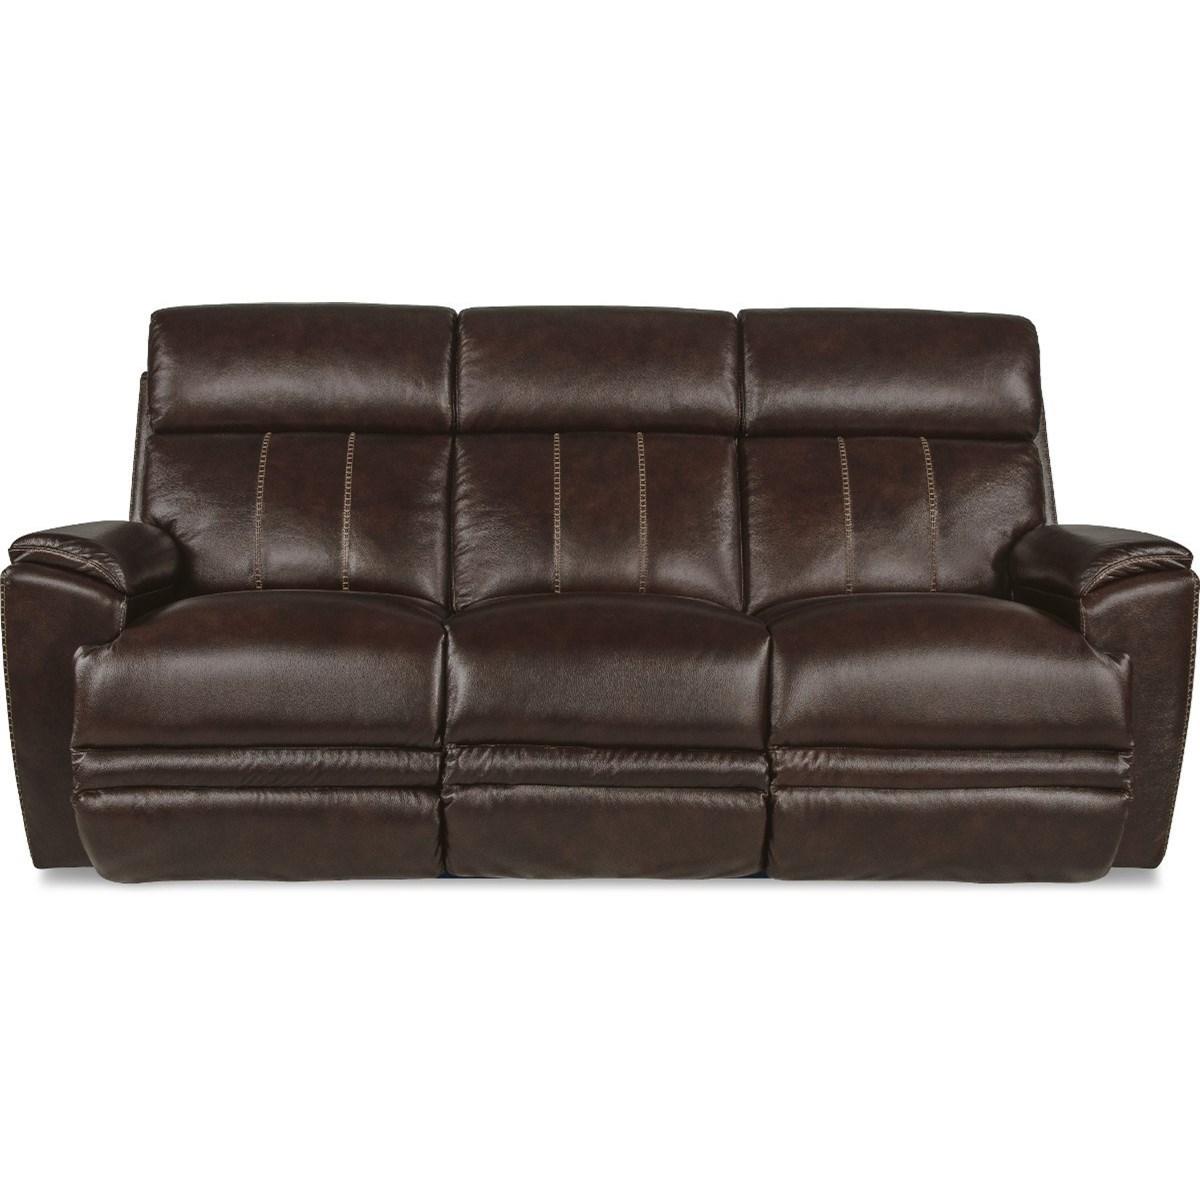 Talladega Power Reclining Sofa w/ Headrests by La-Z-Boy at Sparks HomeStore